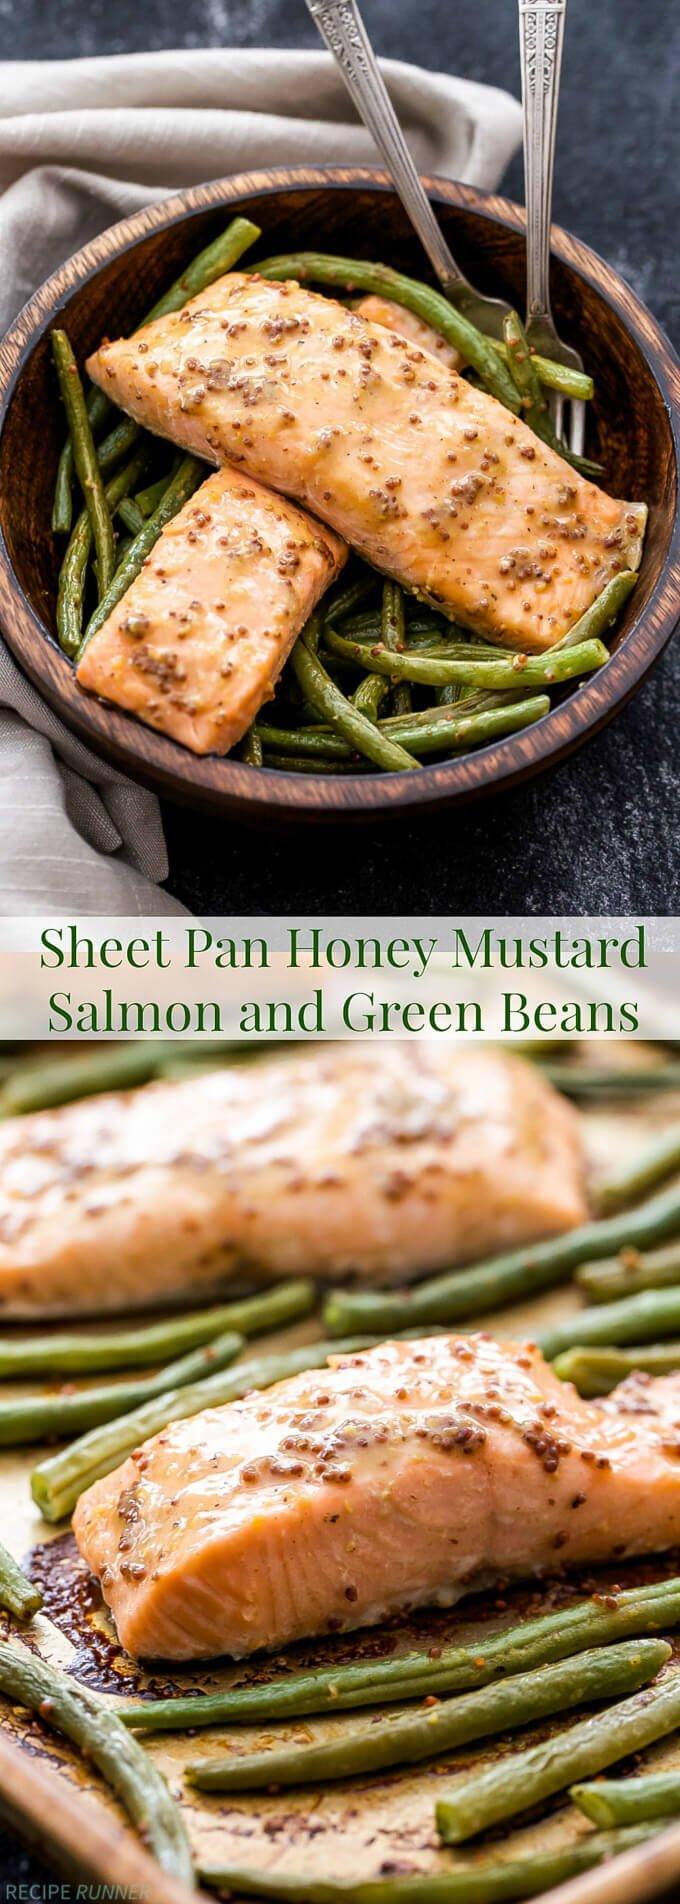 Sheet Pan Honey Mustard Salmon and Green Beans - Recipe Runner